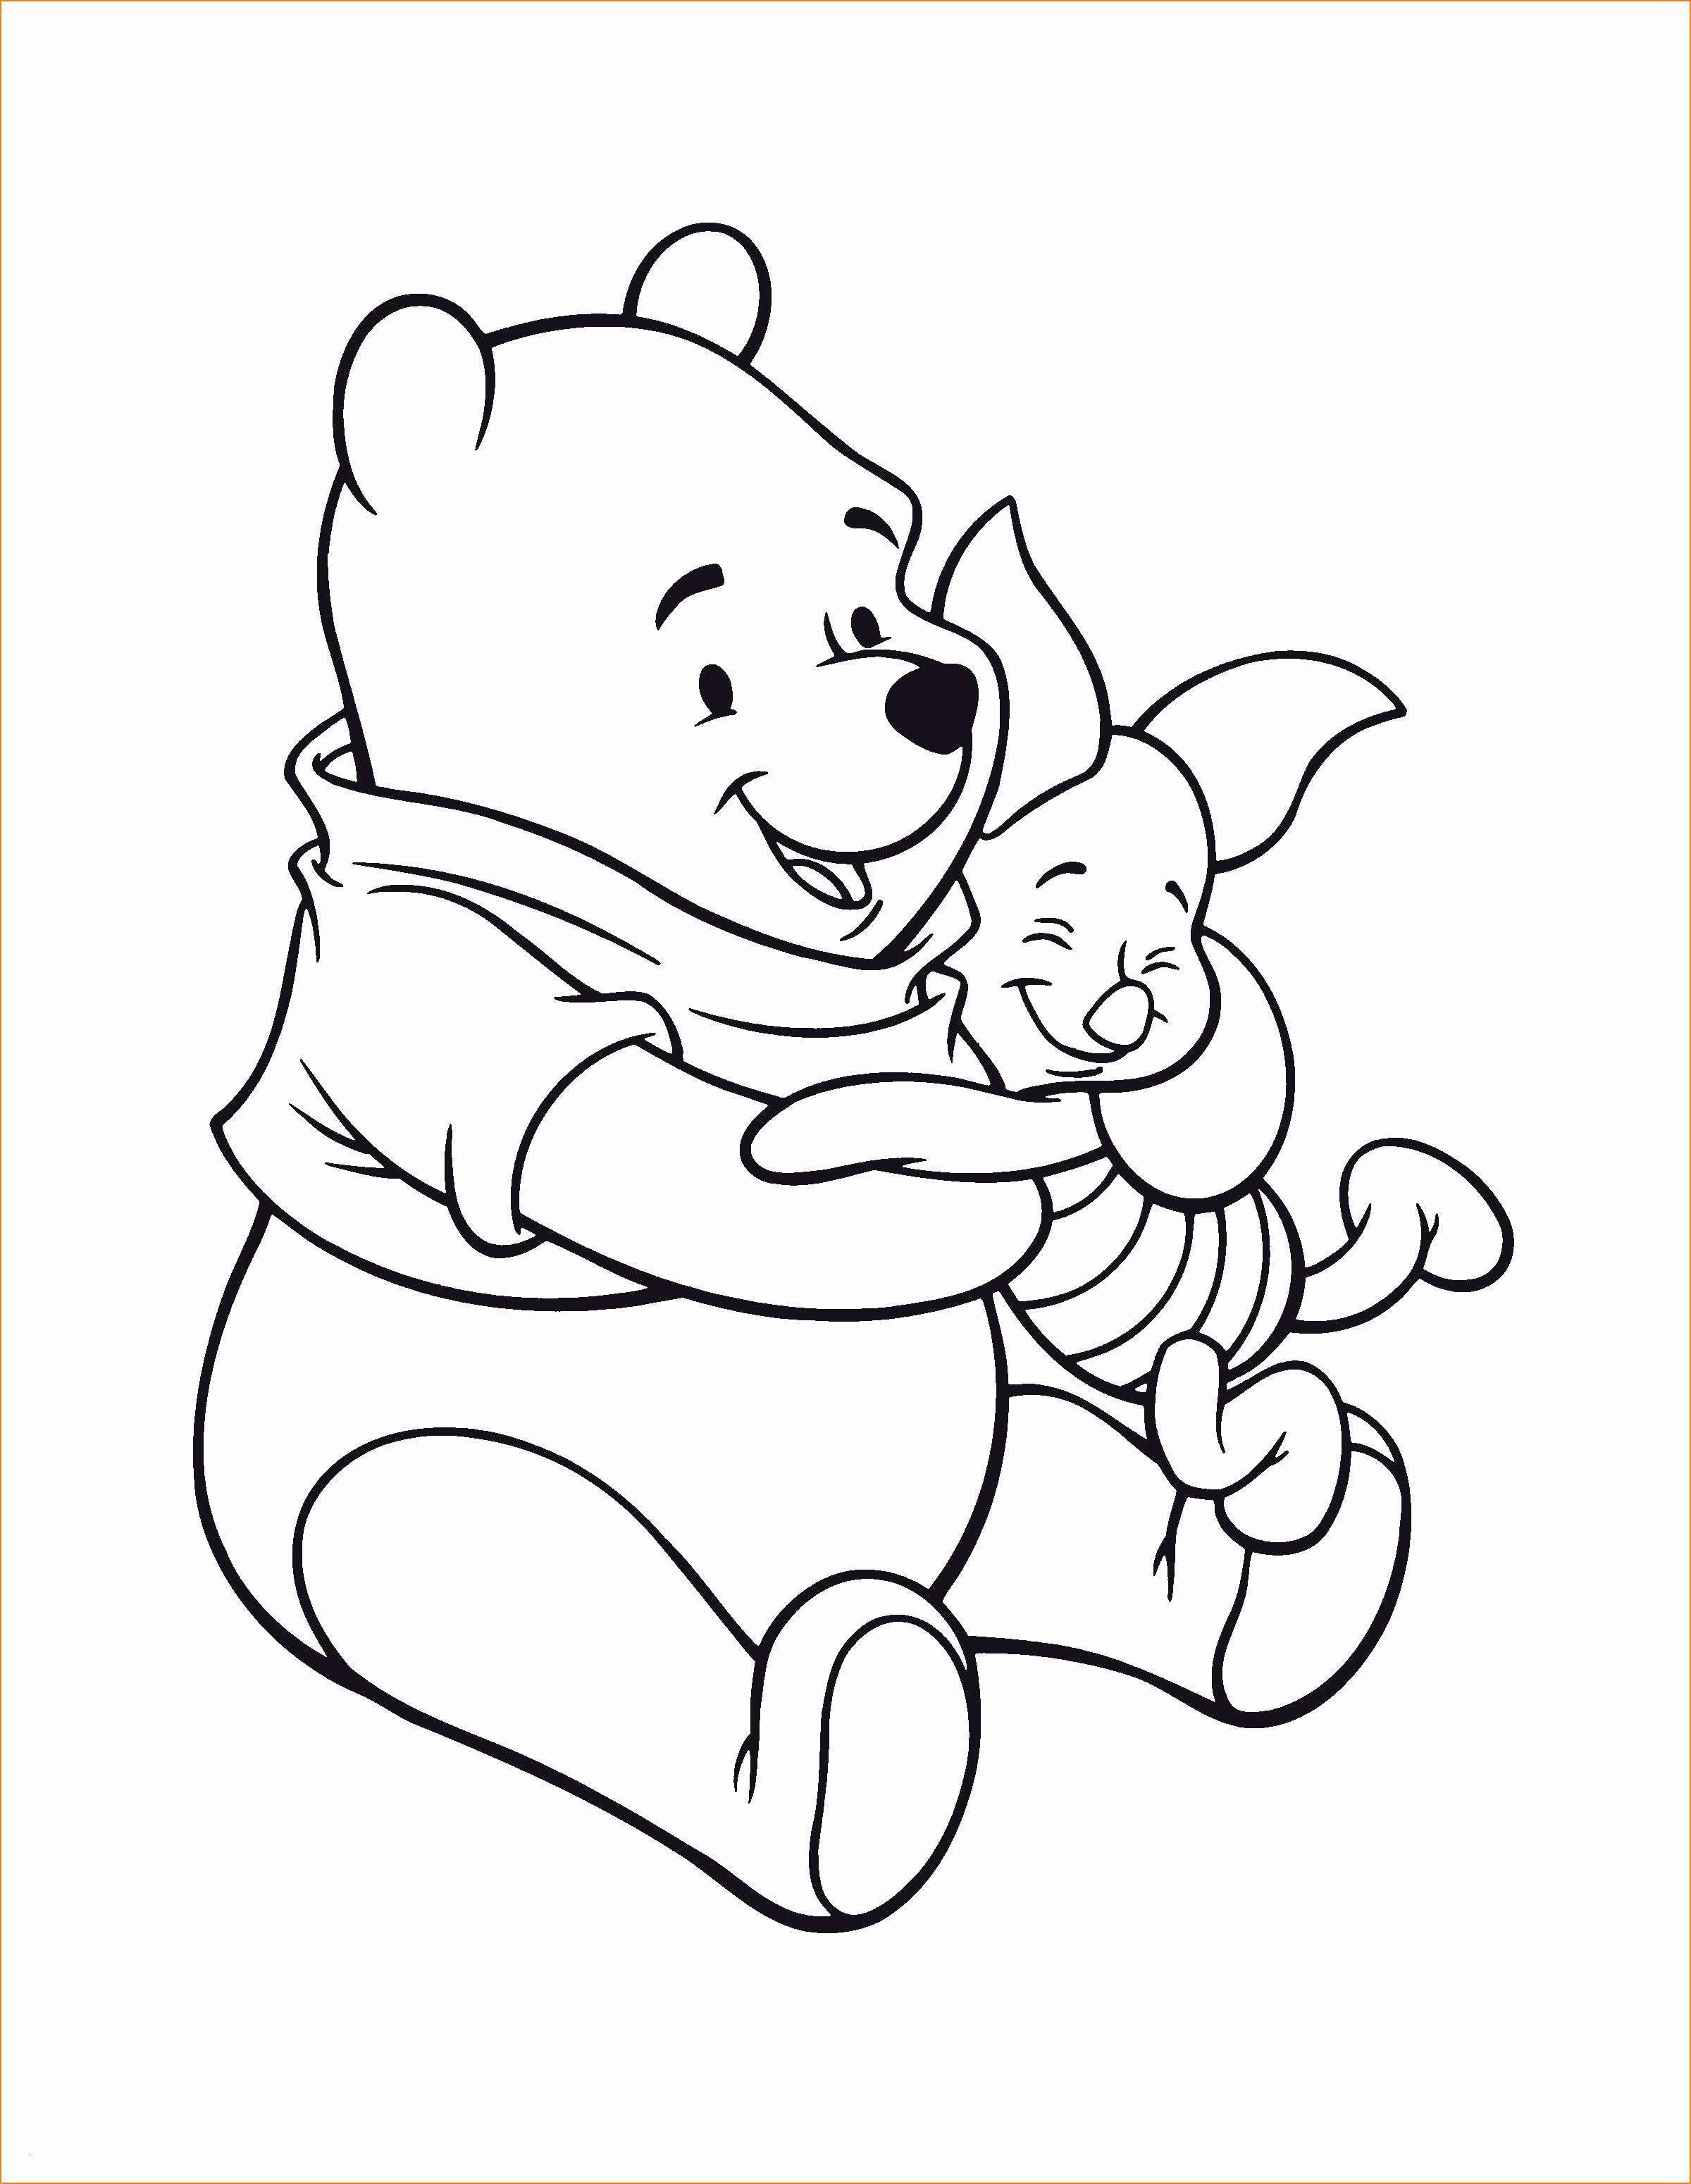 Ausmalbild Winnie Pooh Neu 40 Winni Pooh Ausmalbilder forstergallery Fotos